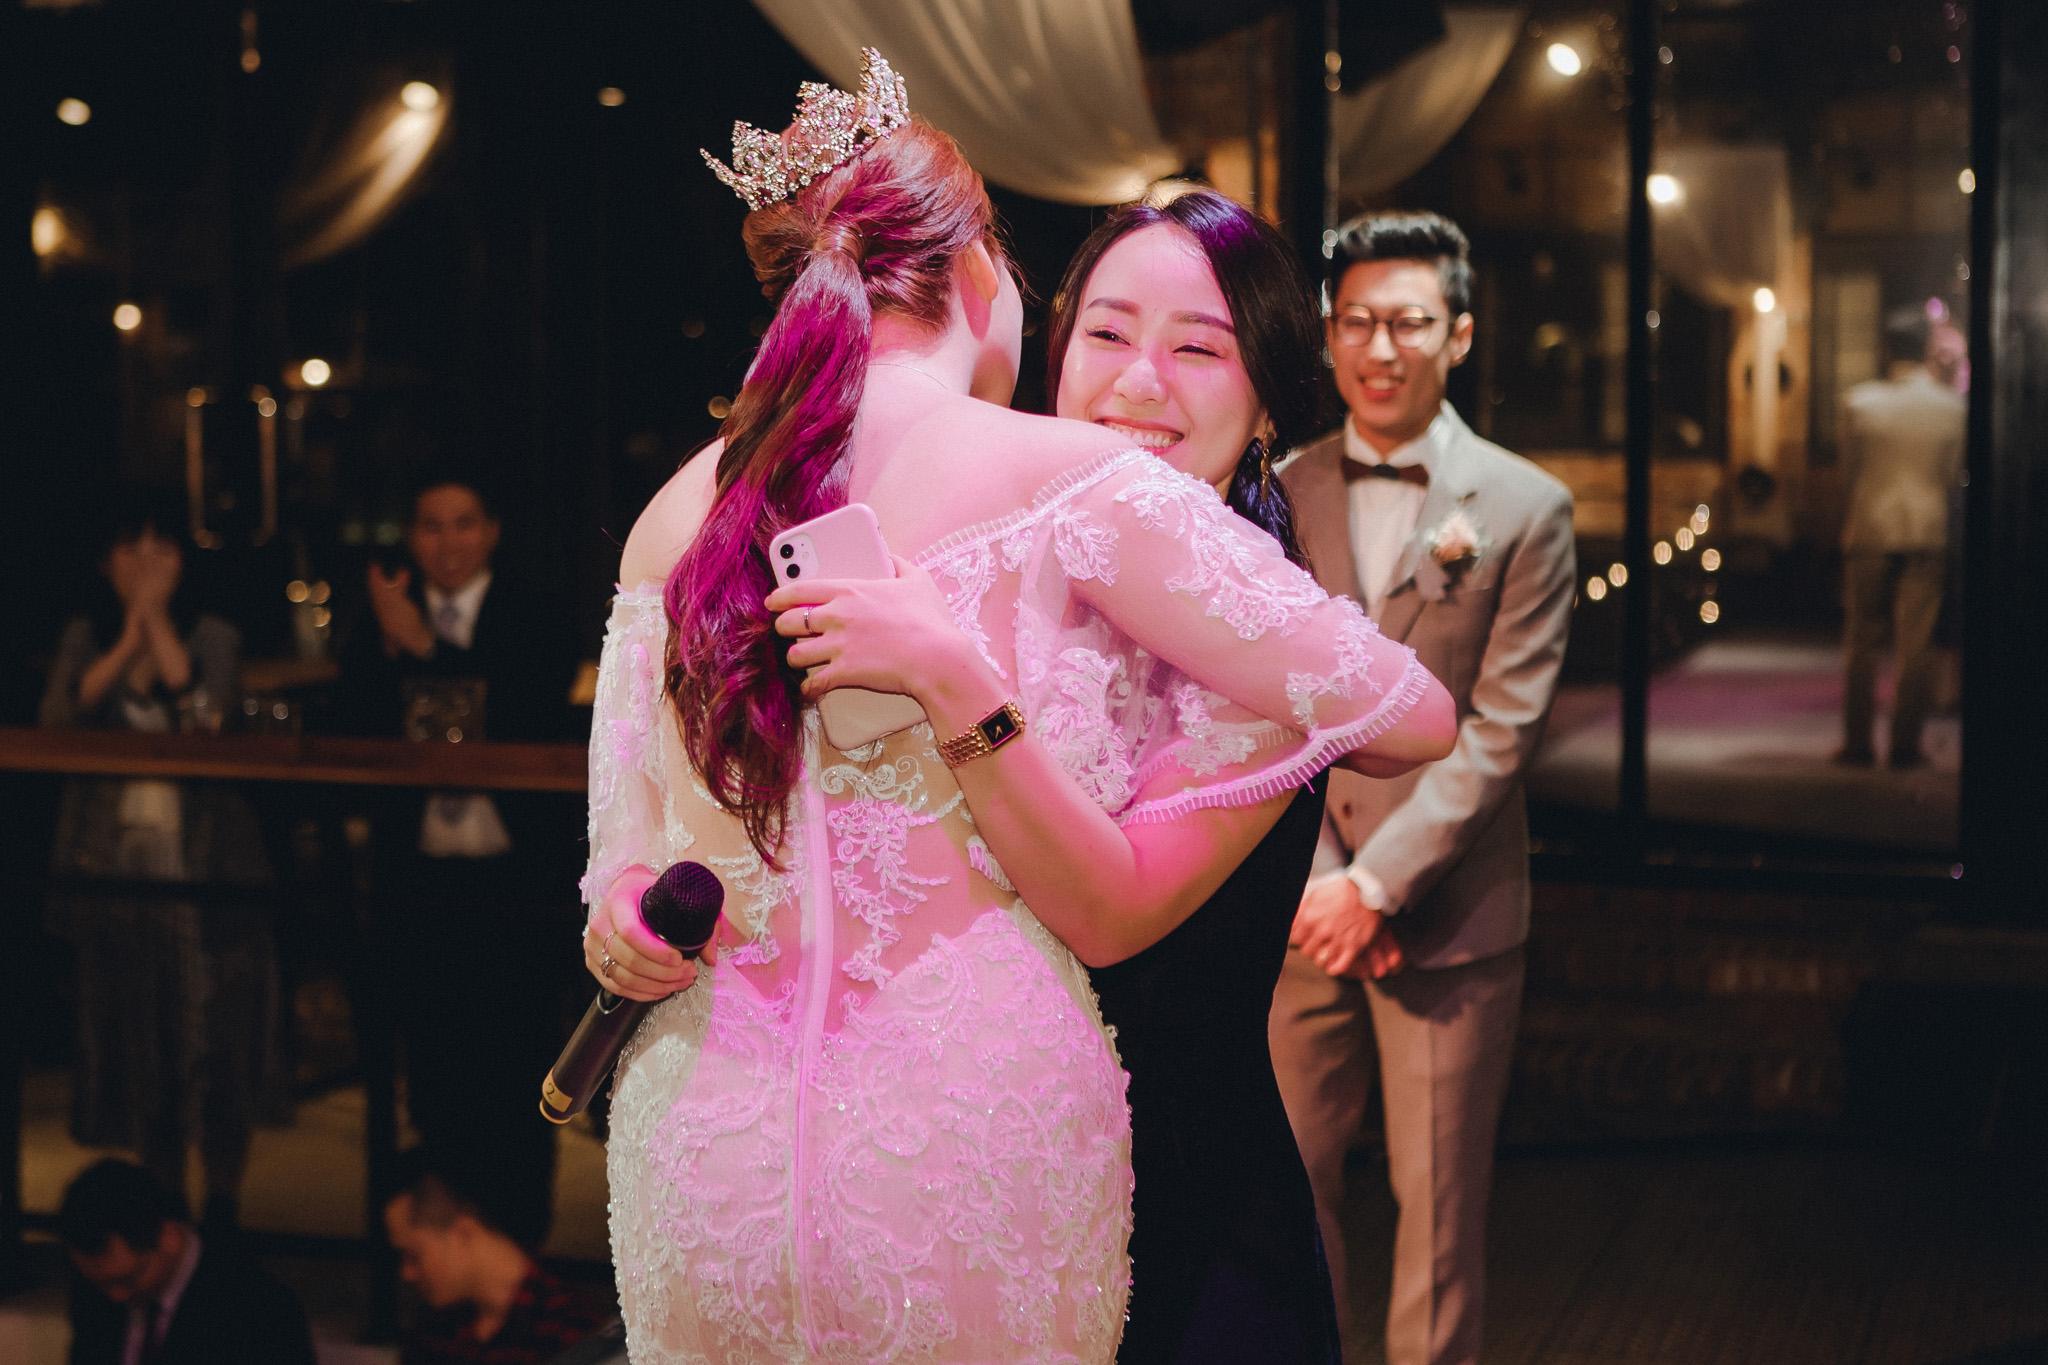 EW 台北婚攝 居米 濟南教會 Brick Yard 33 美軍俱樂部 婚禮 婚宴-103